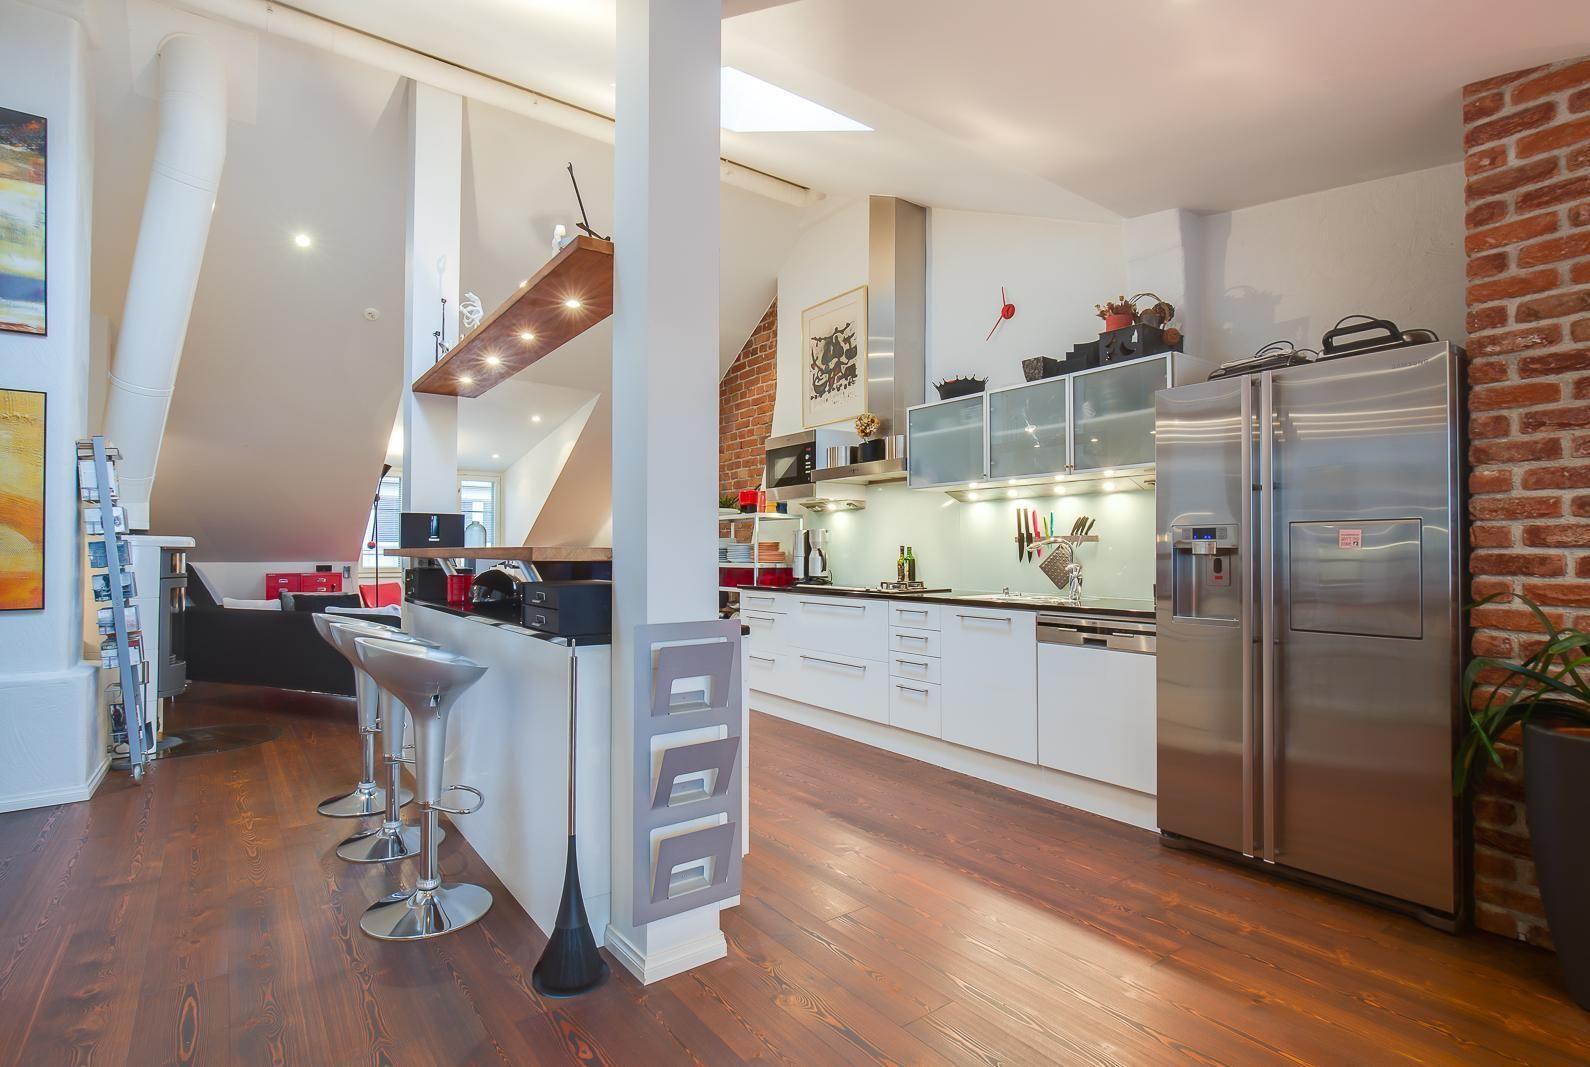 Modern finnish kitchen  Sisustus - Keittiö - Moderni - 5471a5cb498ef46ec062d6a5 - sisustus.etuovi.com